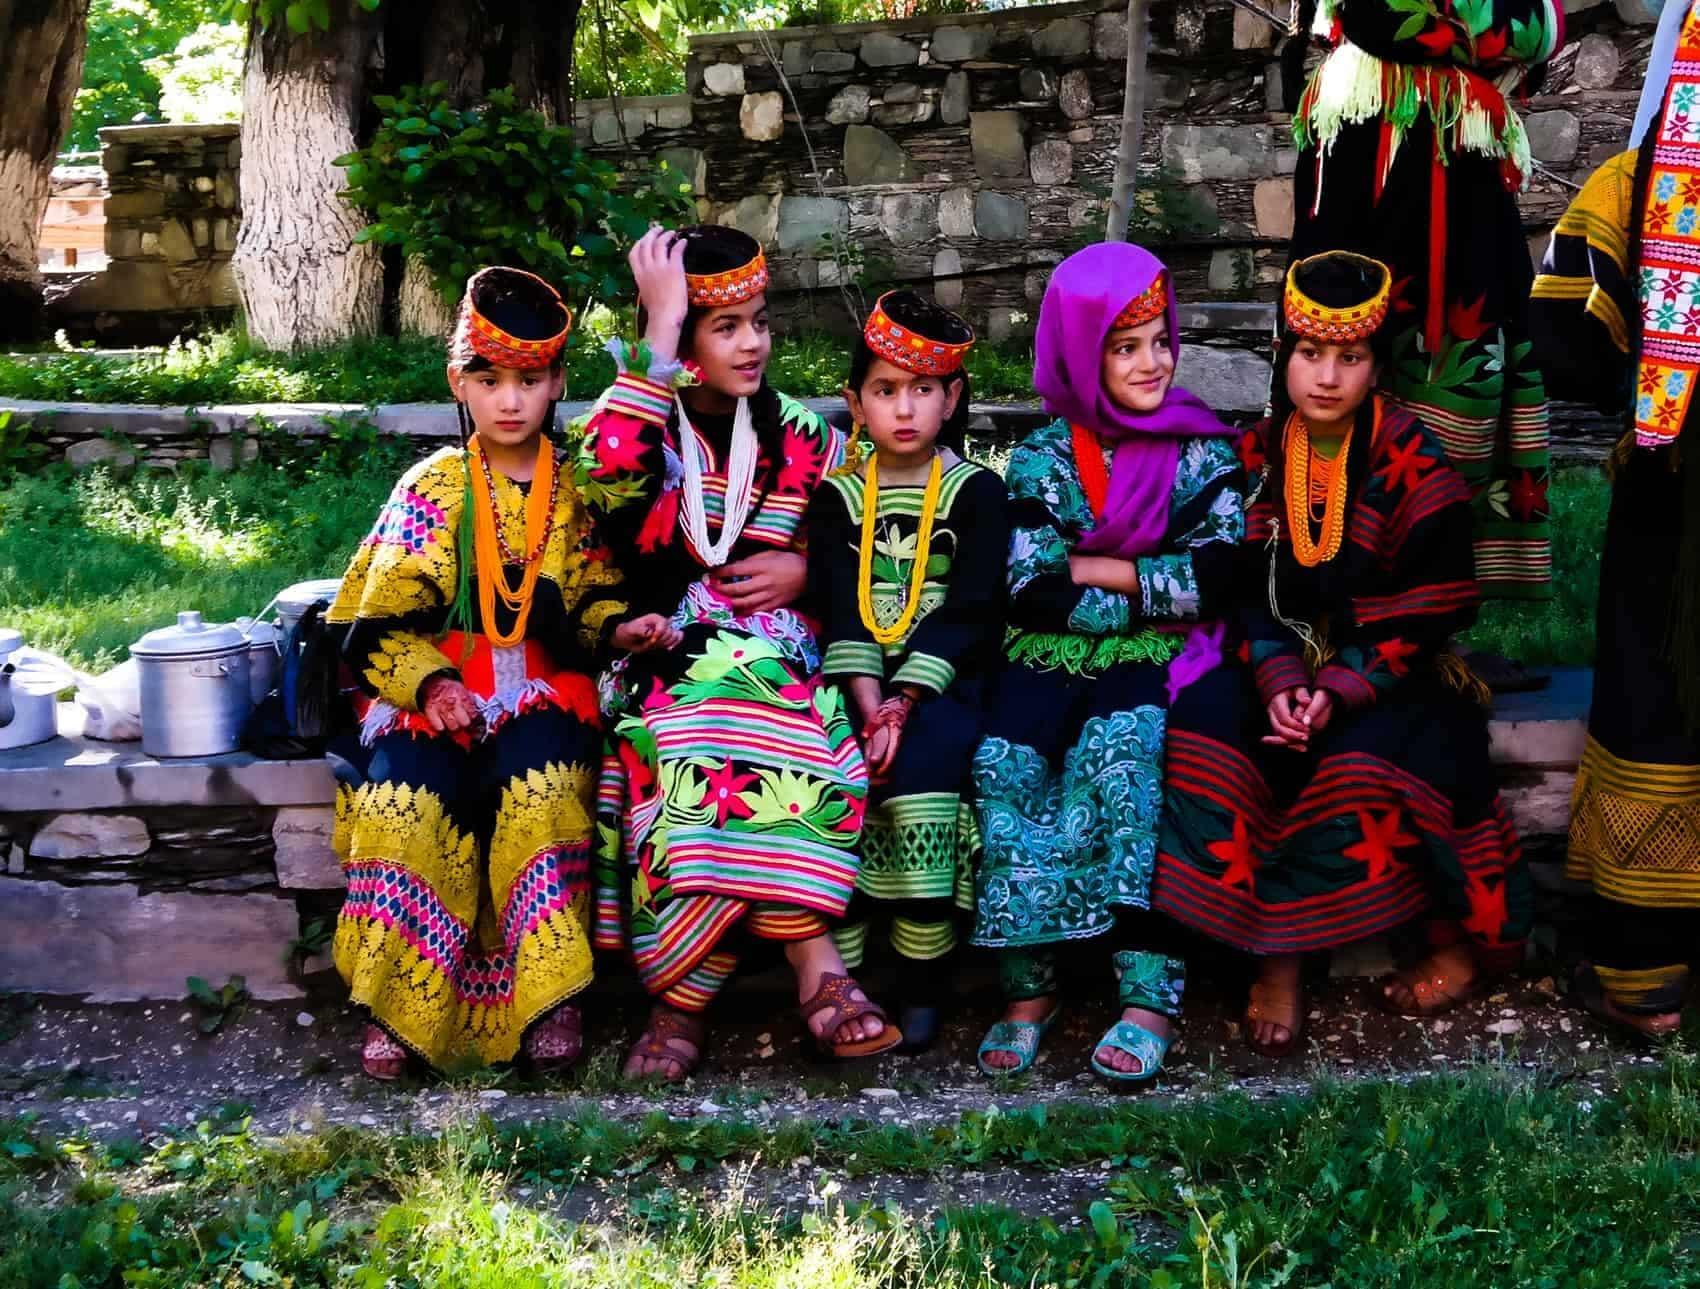 Portrait of Kalash tribe woman in national costume at Joshi fest - 14-05-2015 Bumburet, Kunar, Pakistan